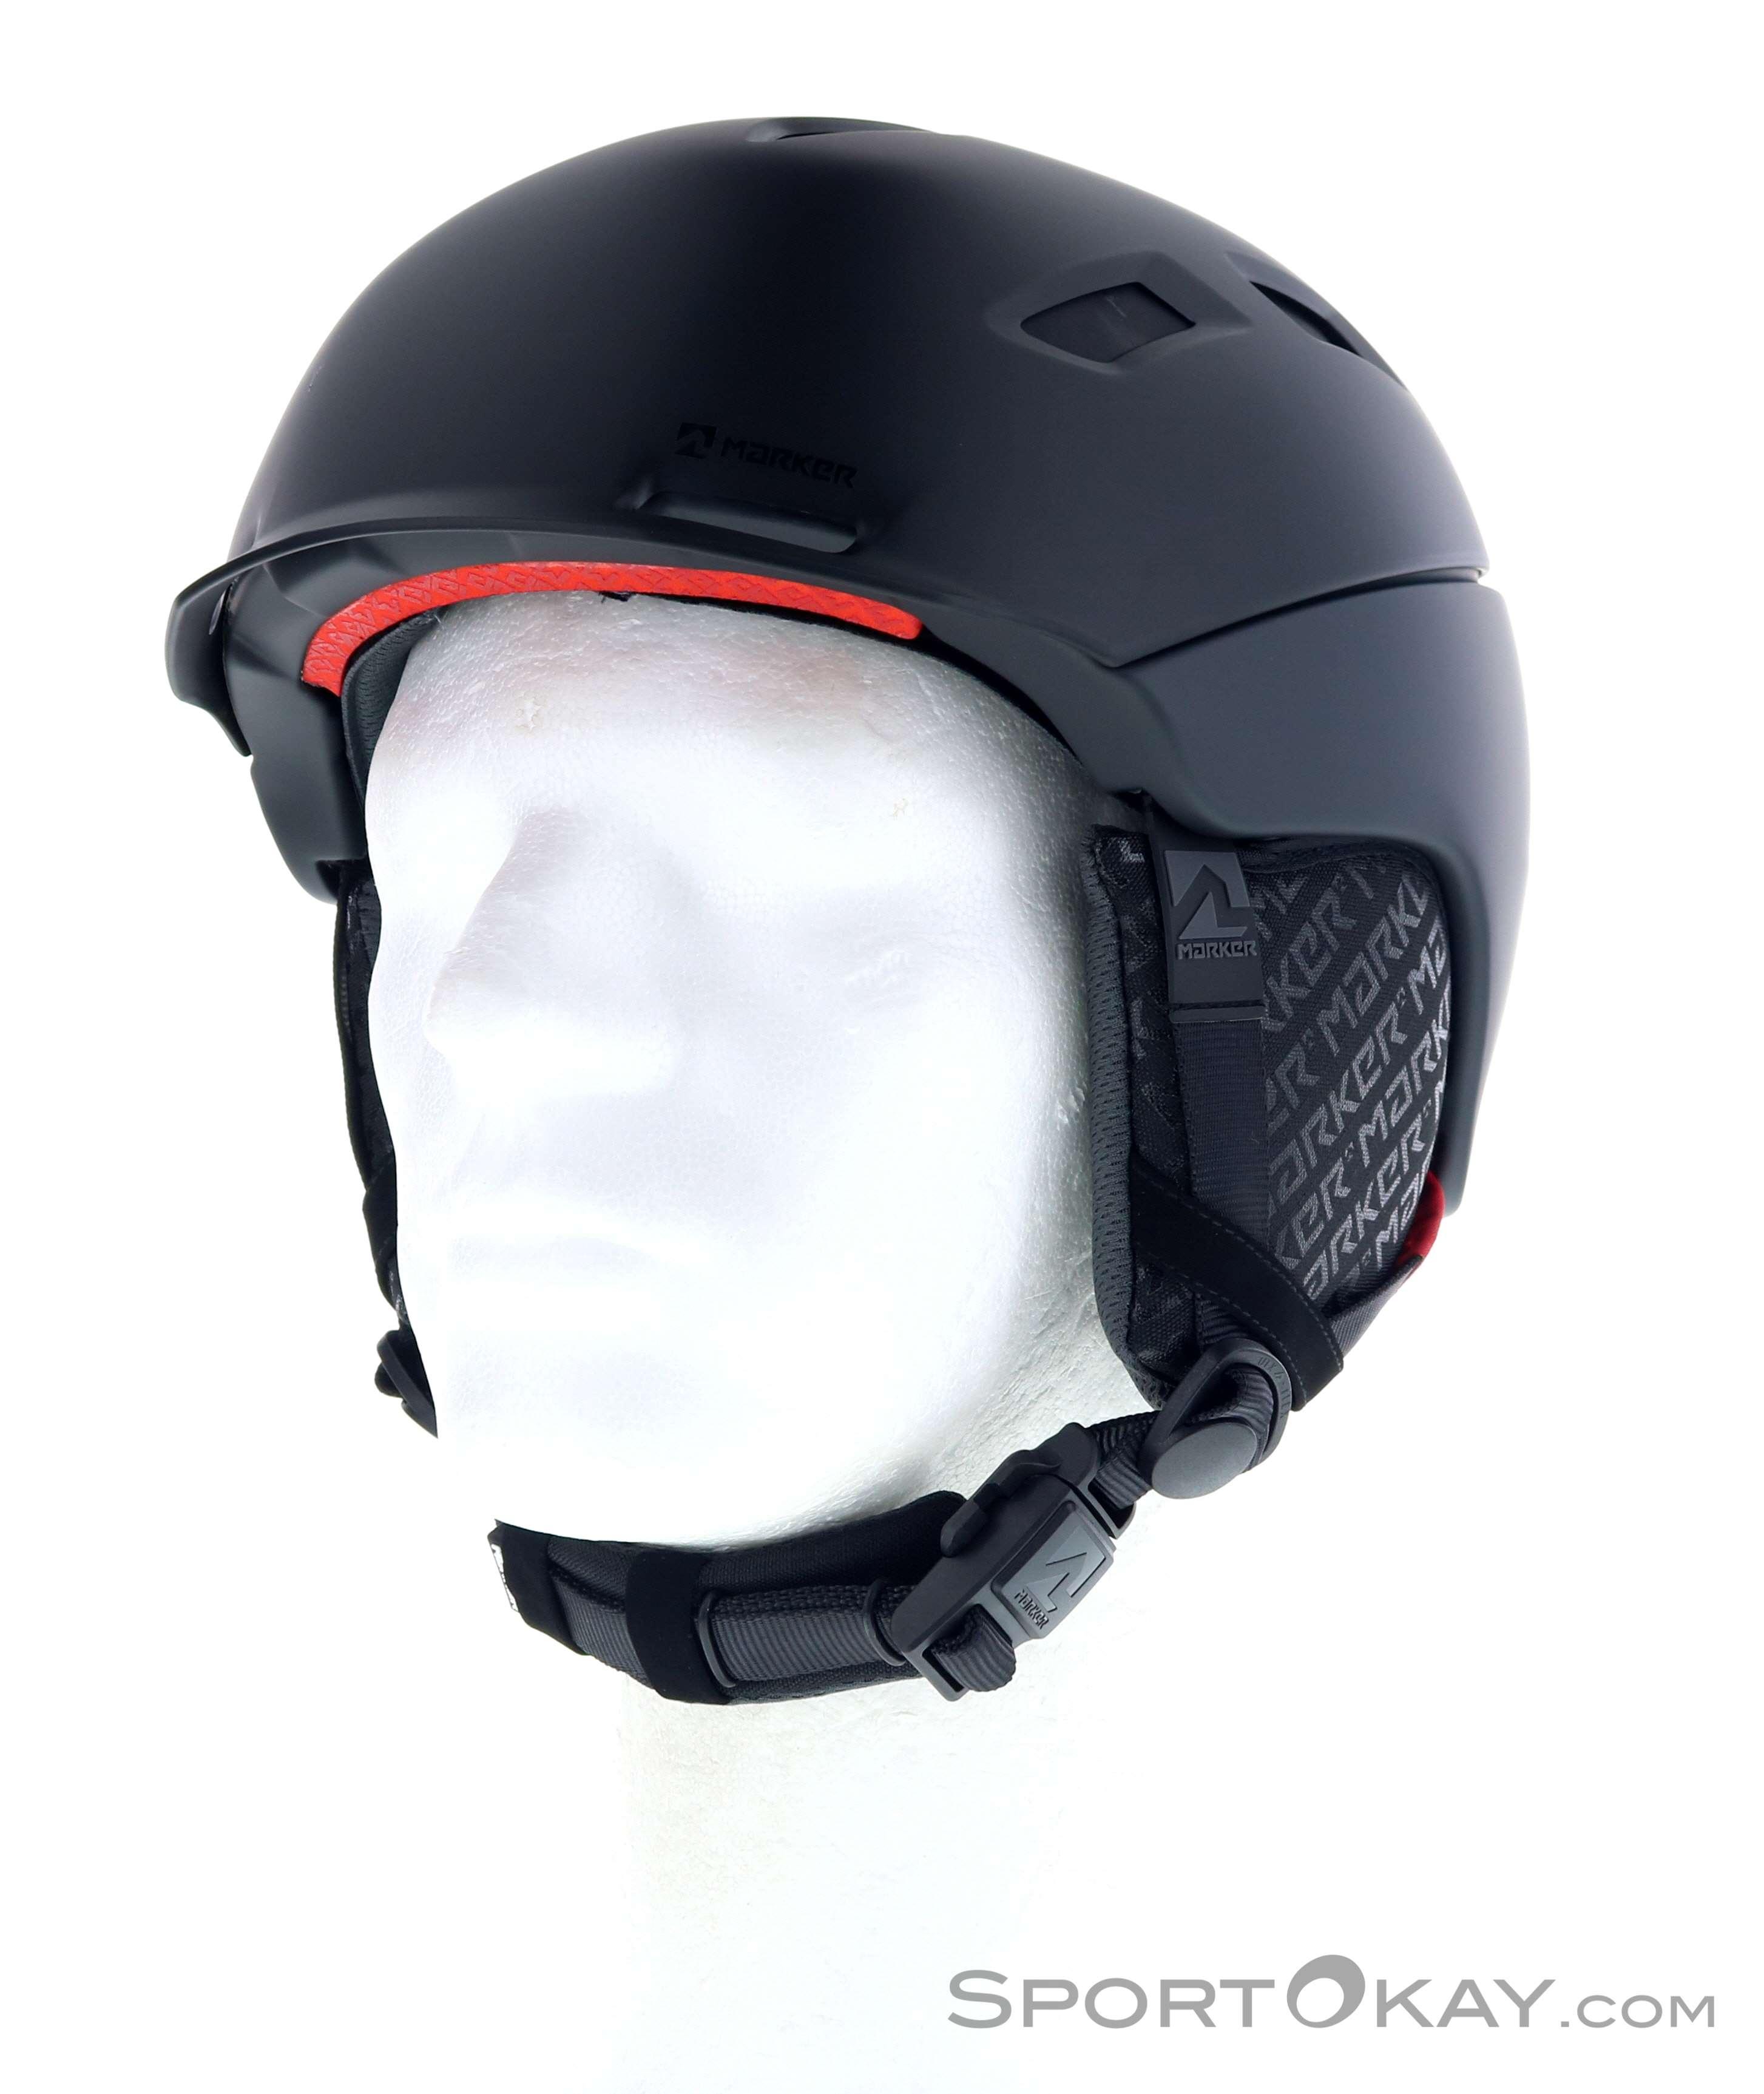 2020 Marker Phoenix MAP Snow Helmet